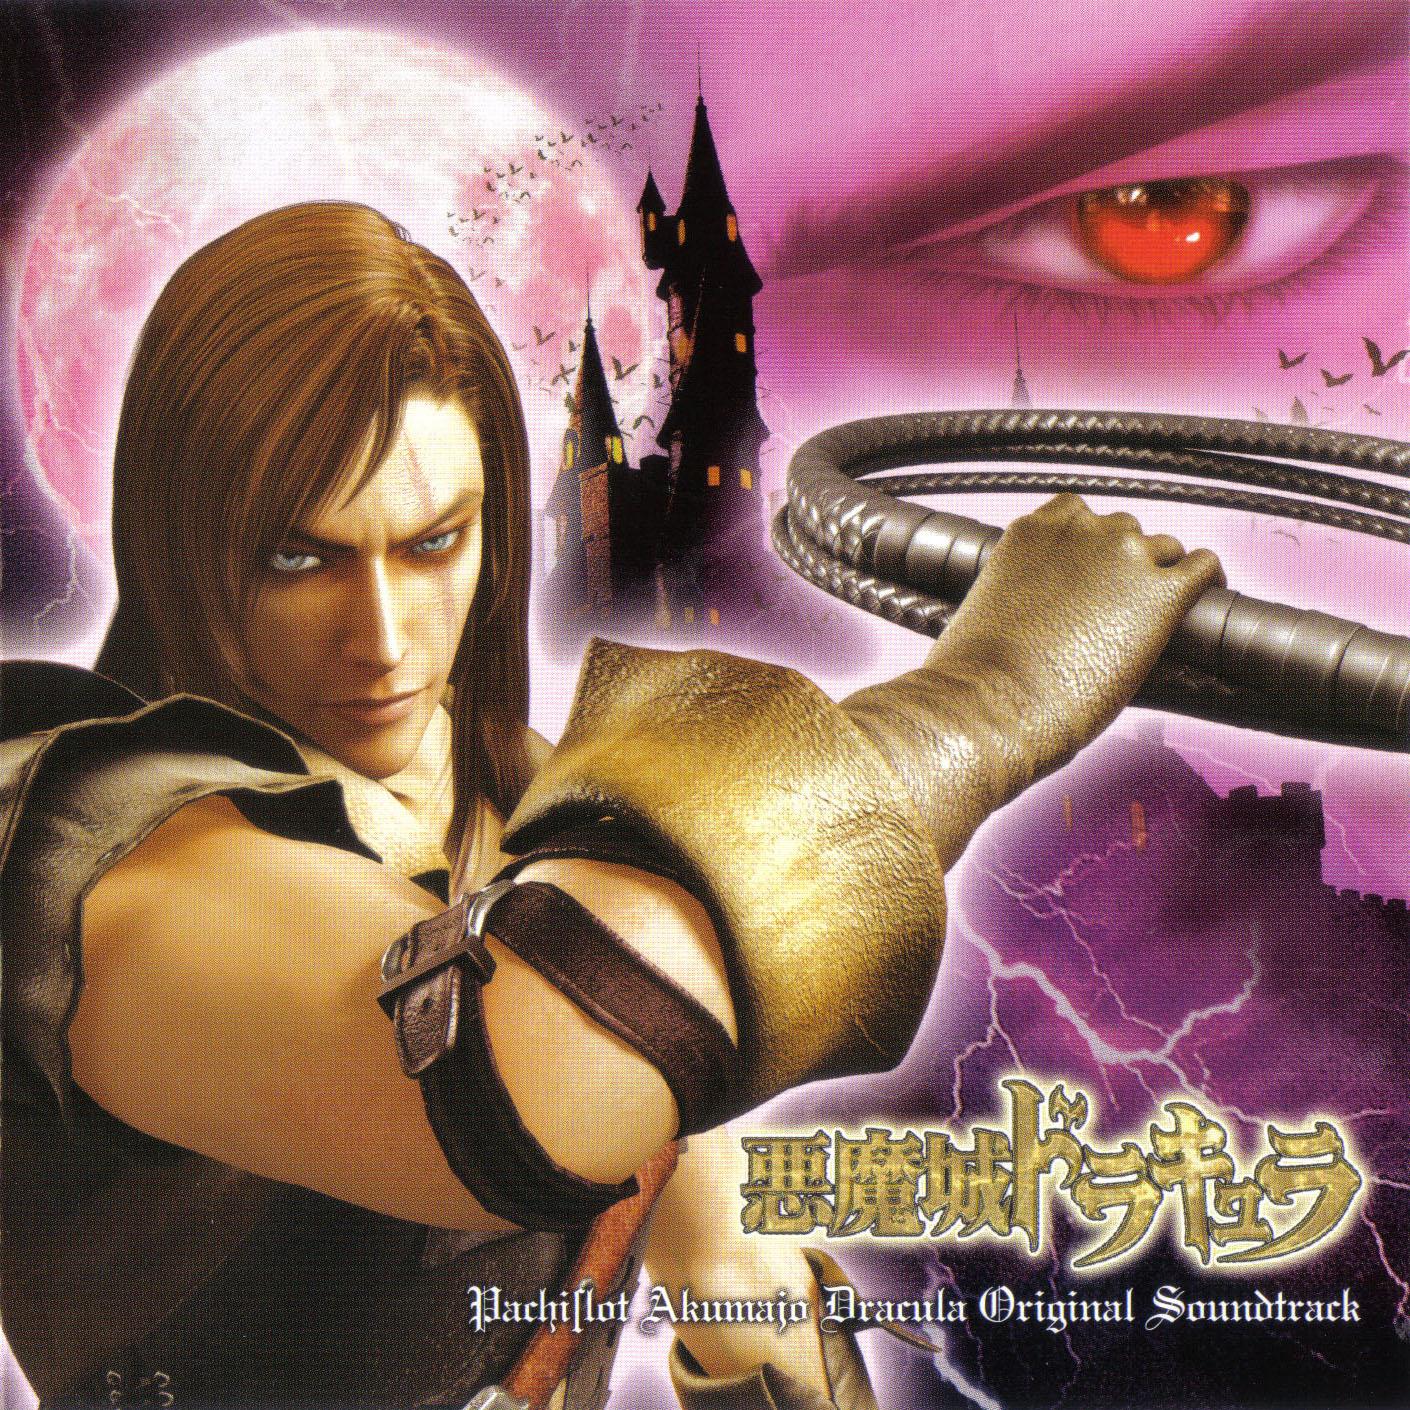 File:Pachislot Akumajo Dracula OST.jpg